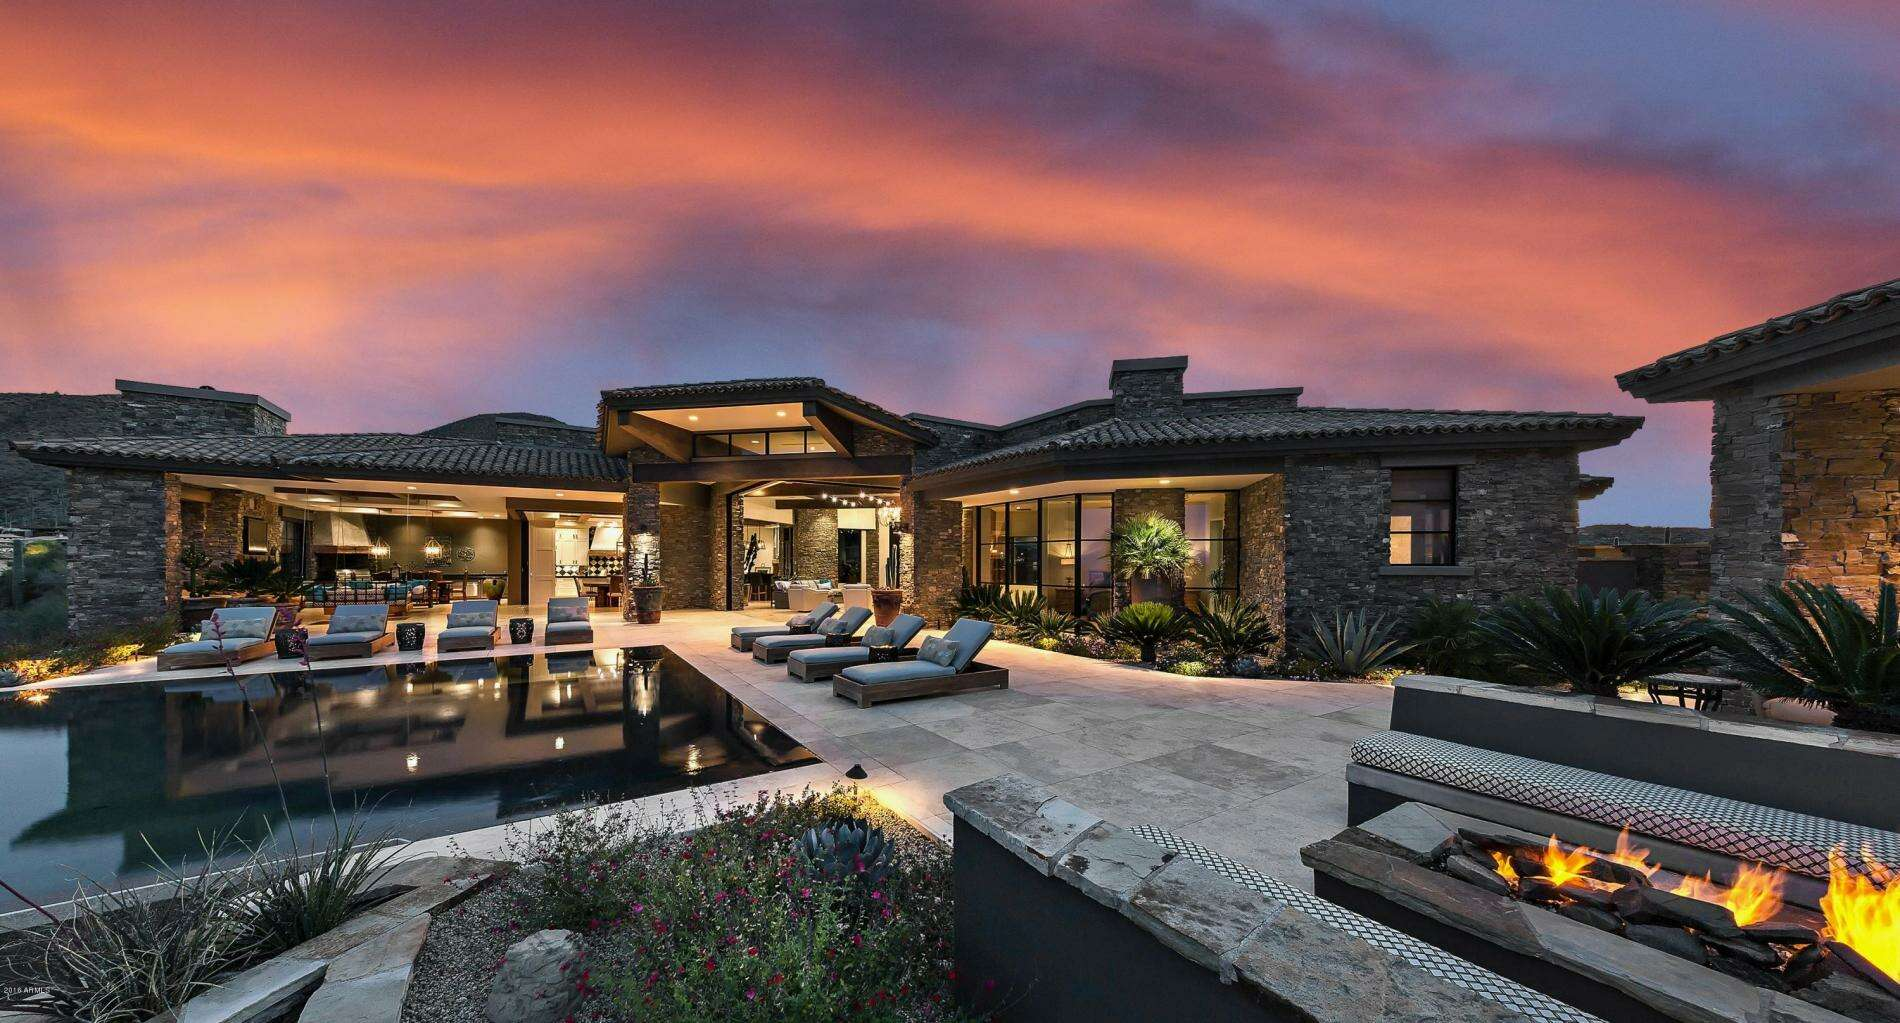 Single Family for Sale at 42154 N 102nd St Scottsdale, Arizona 85262 United States